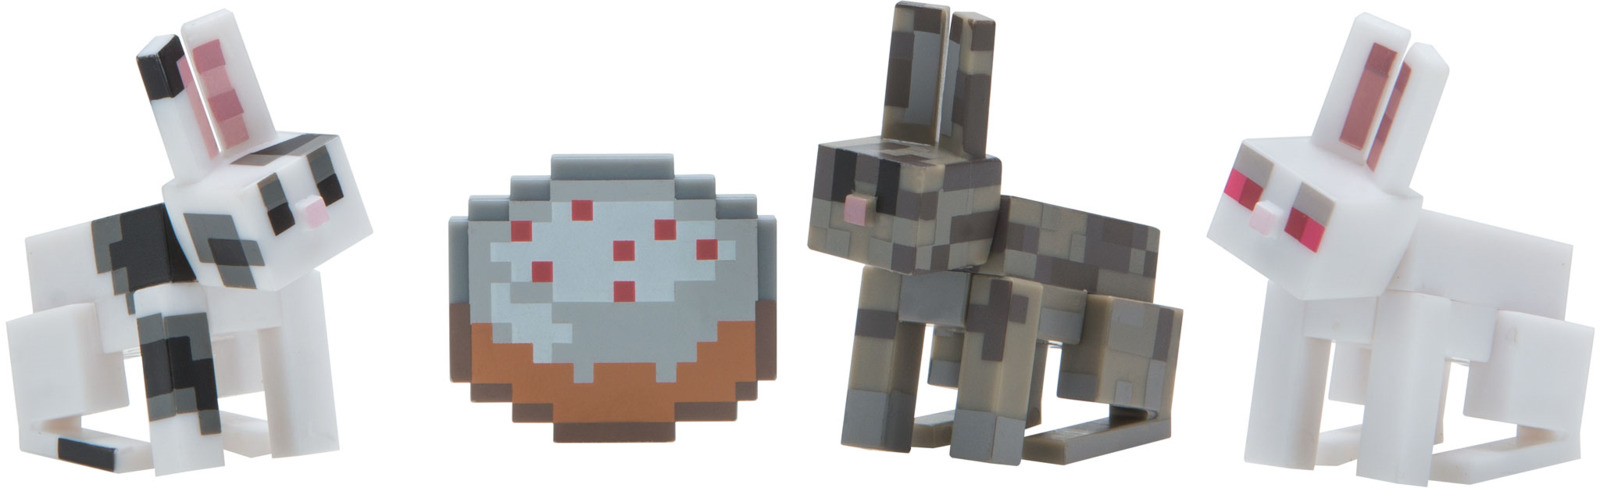 Набор фигурок Minecraft Chase Bunnies, 3 шт набор фигурок minecraft blacksmith with apron and anvil 8 см